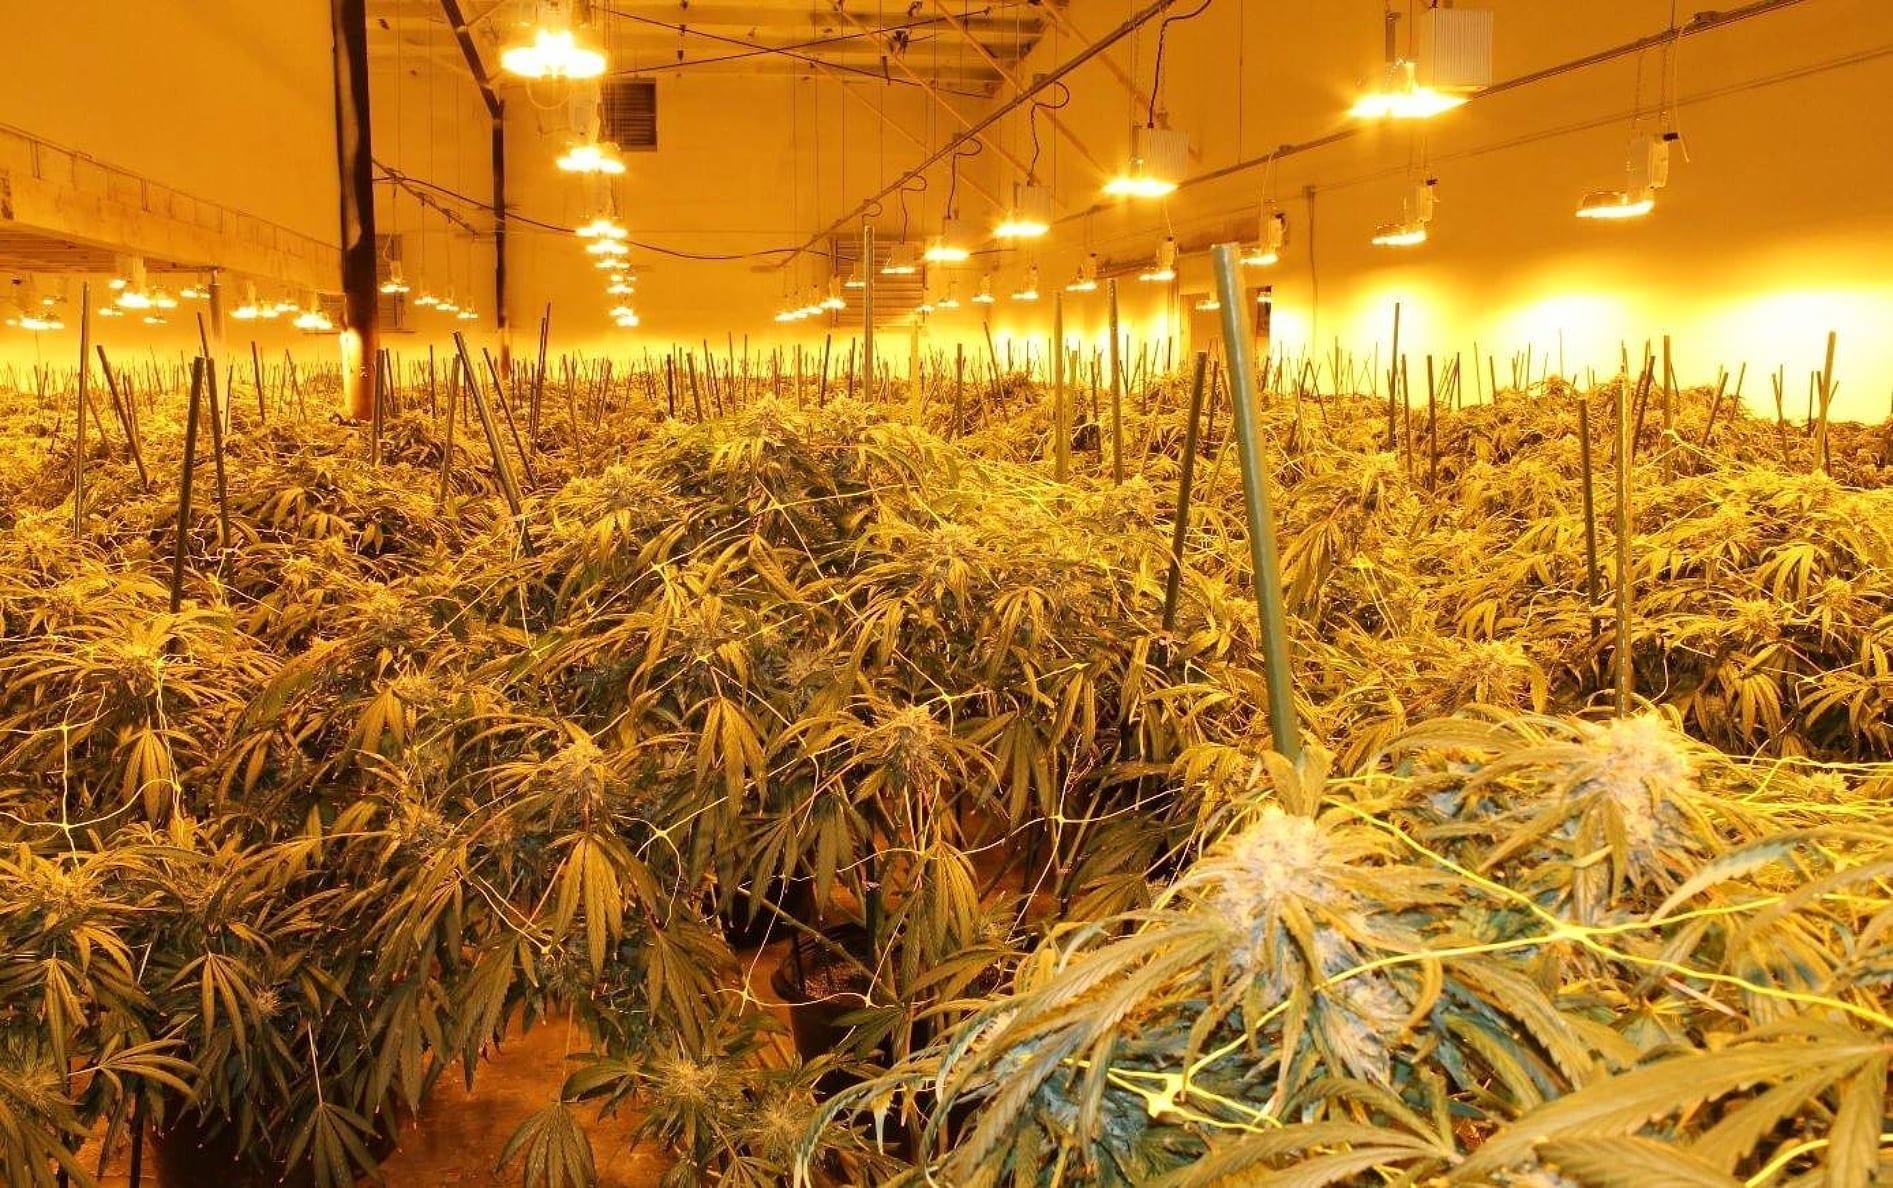 Salmon Arm RCMP seize cannabis plants, cocaine, cash from illicit grow